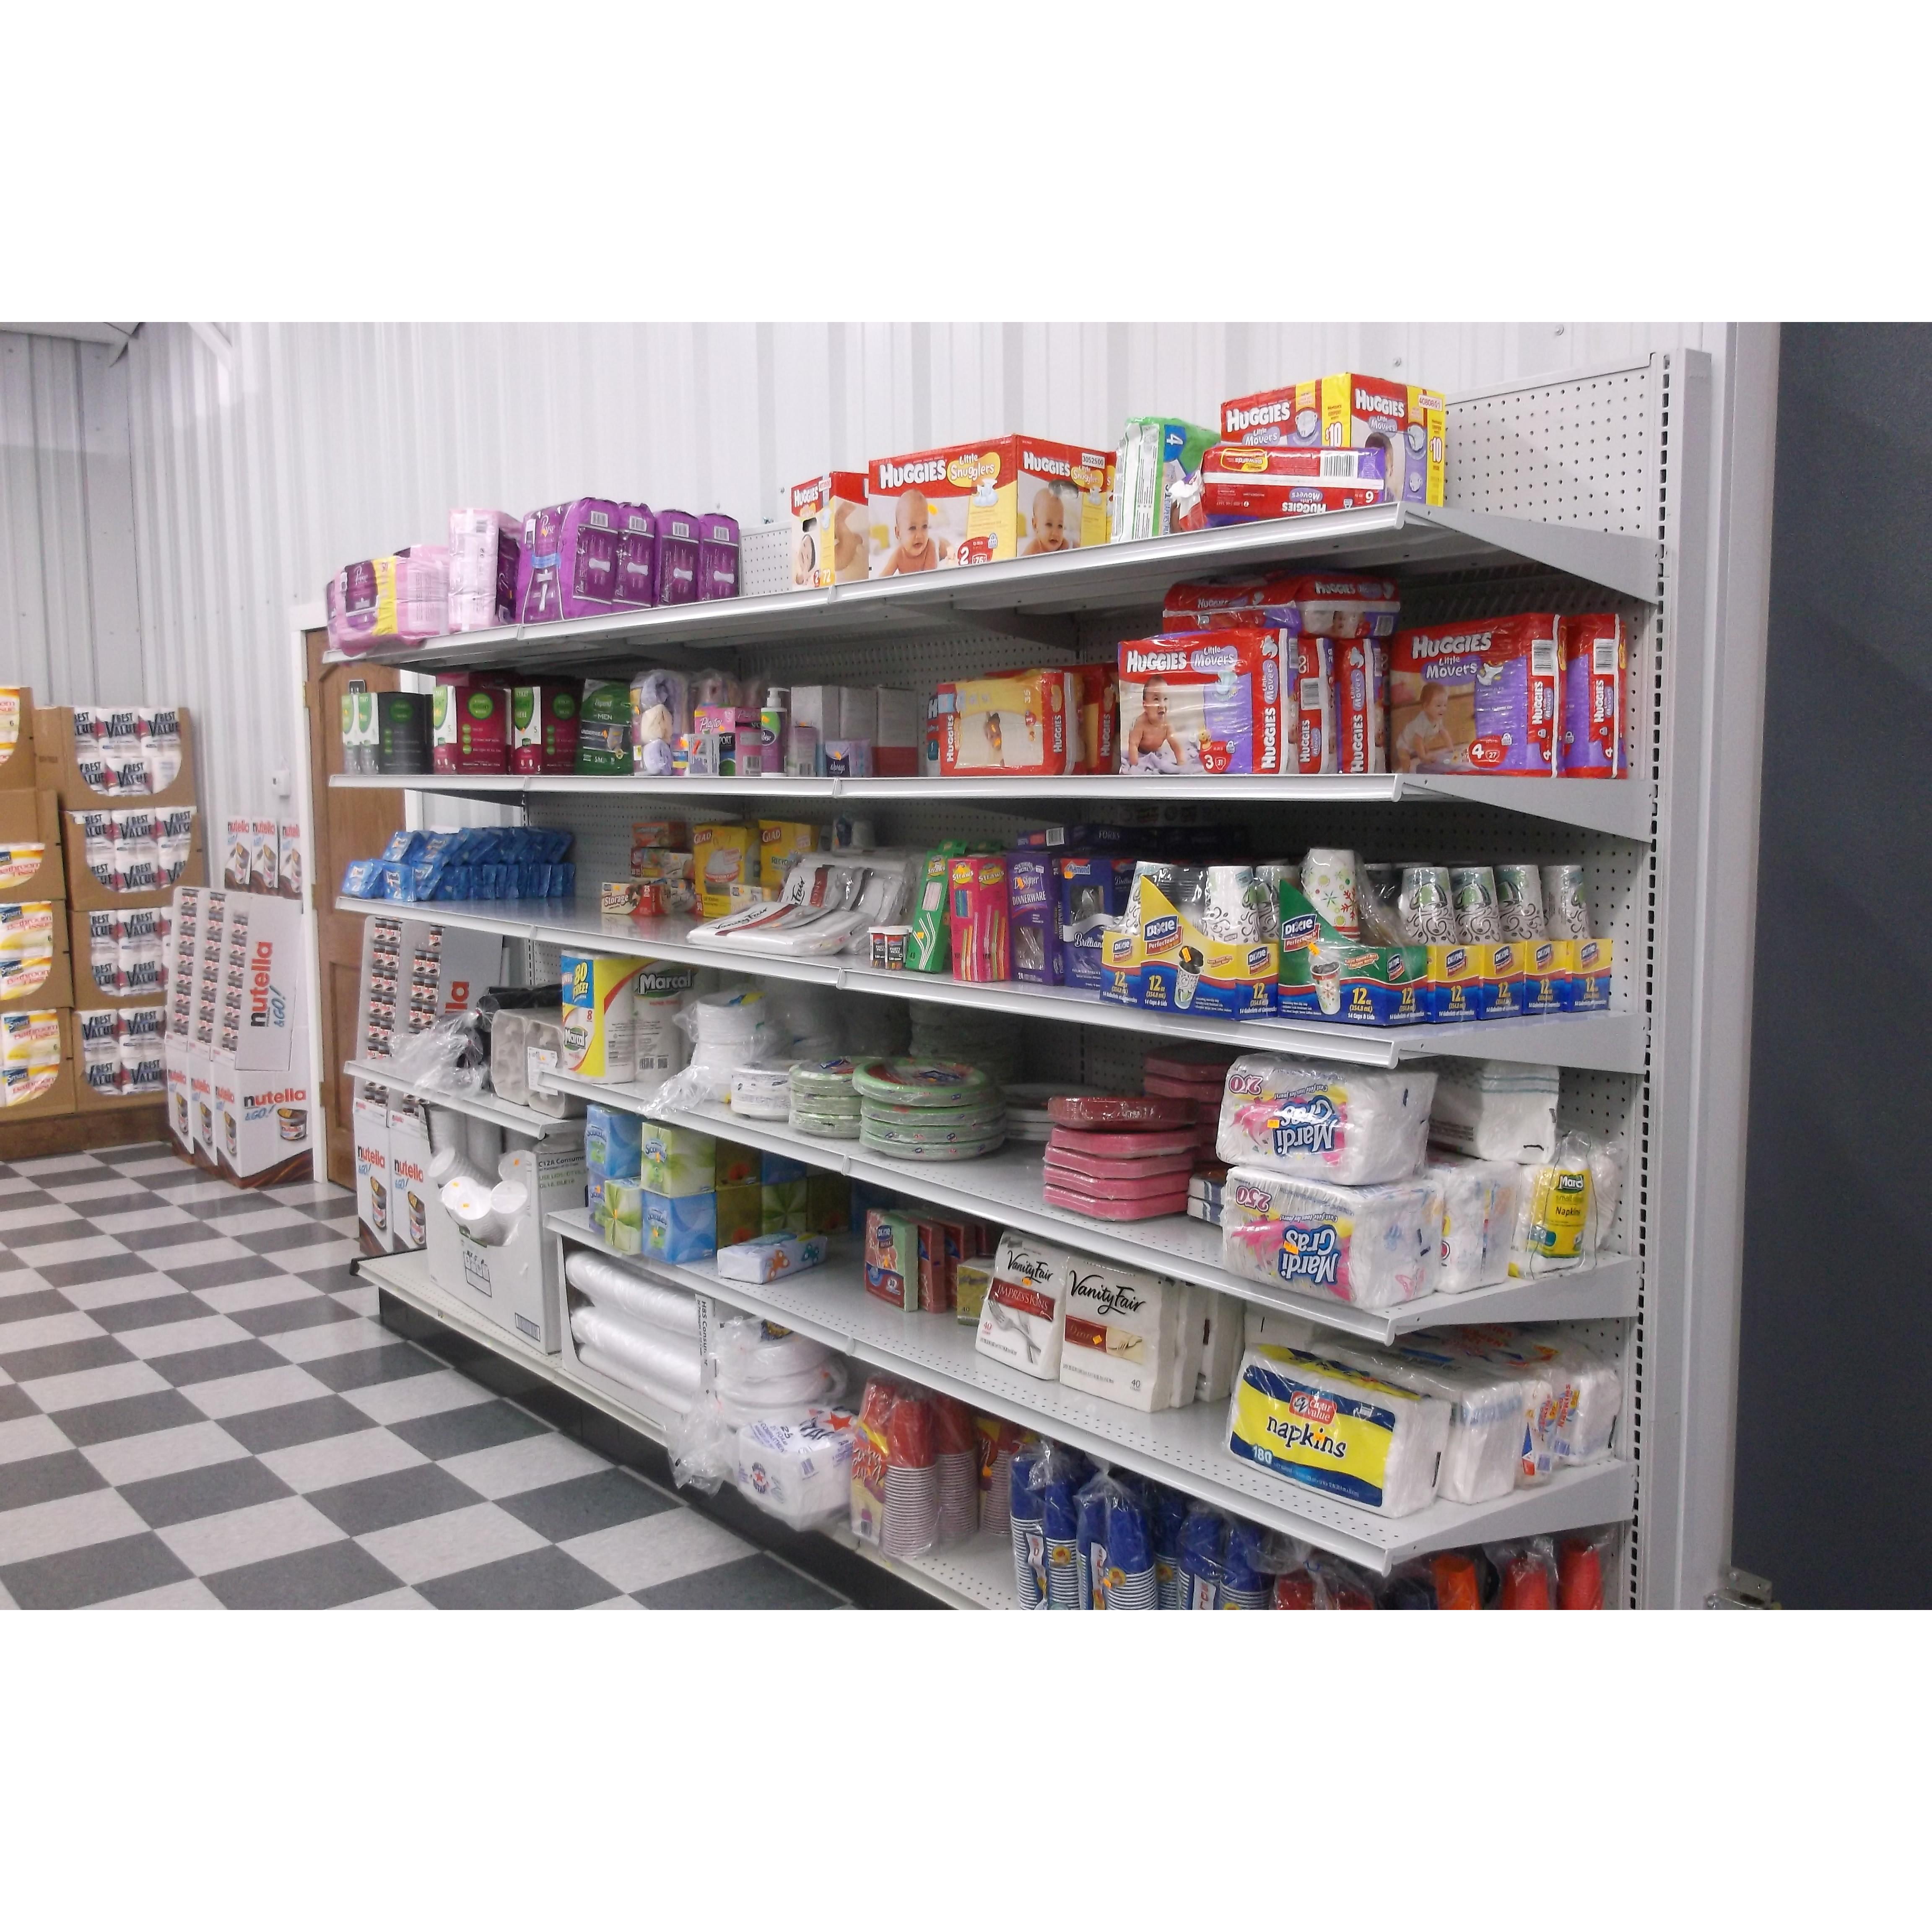 Mishler's General Store